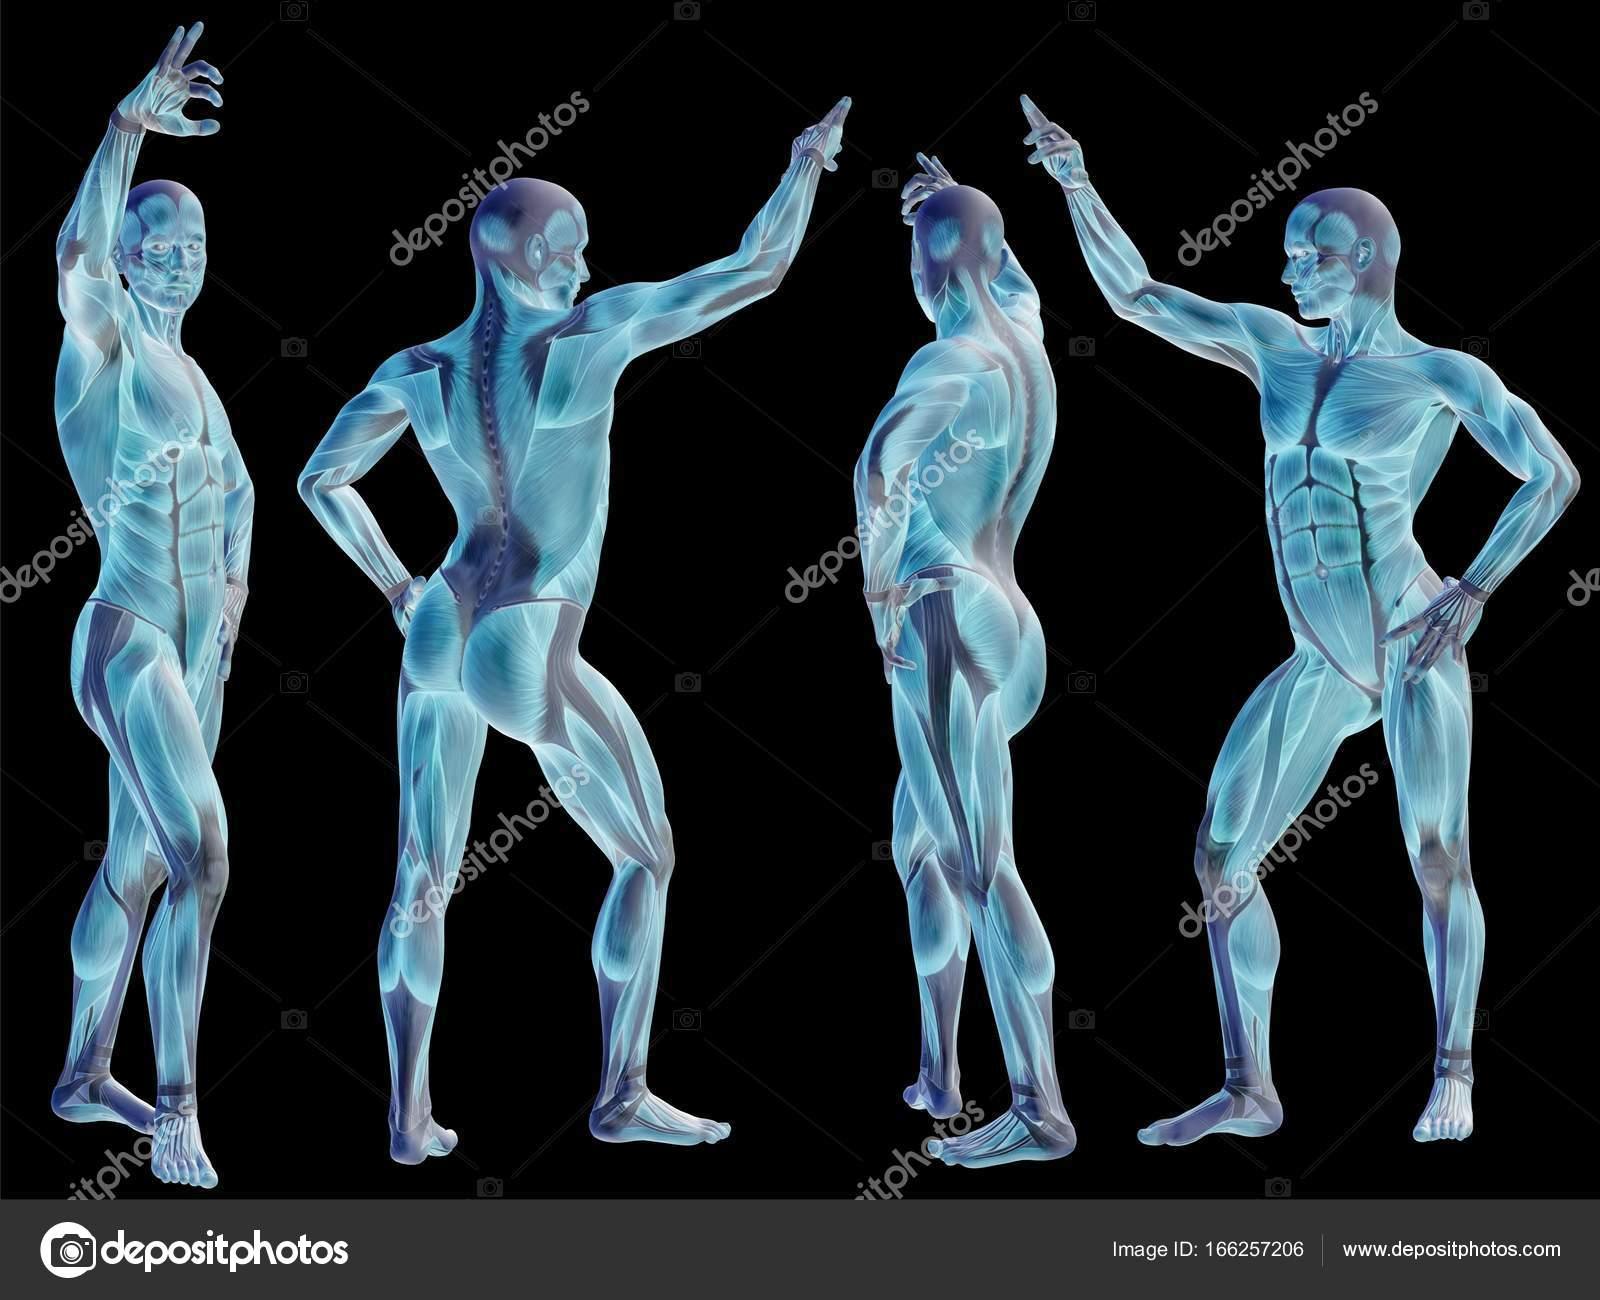 Conceptual 3d Human Anatomy Stock Photo Design36 166257206